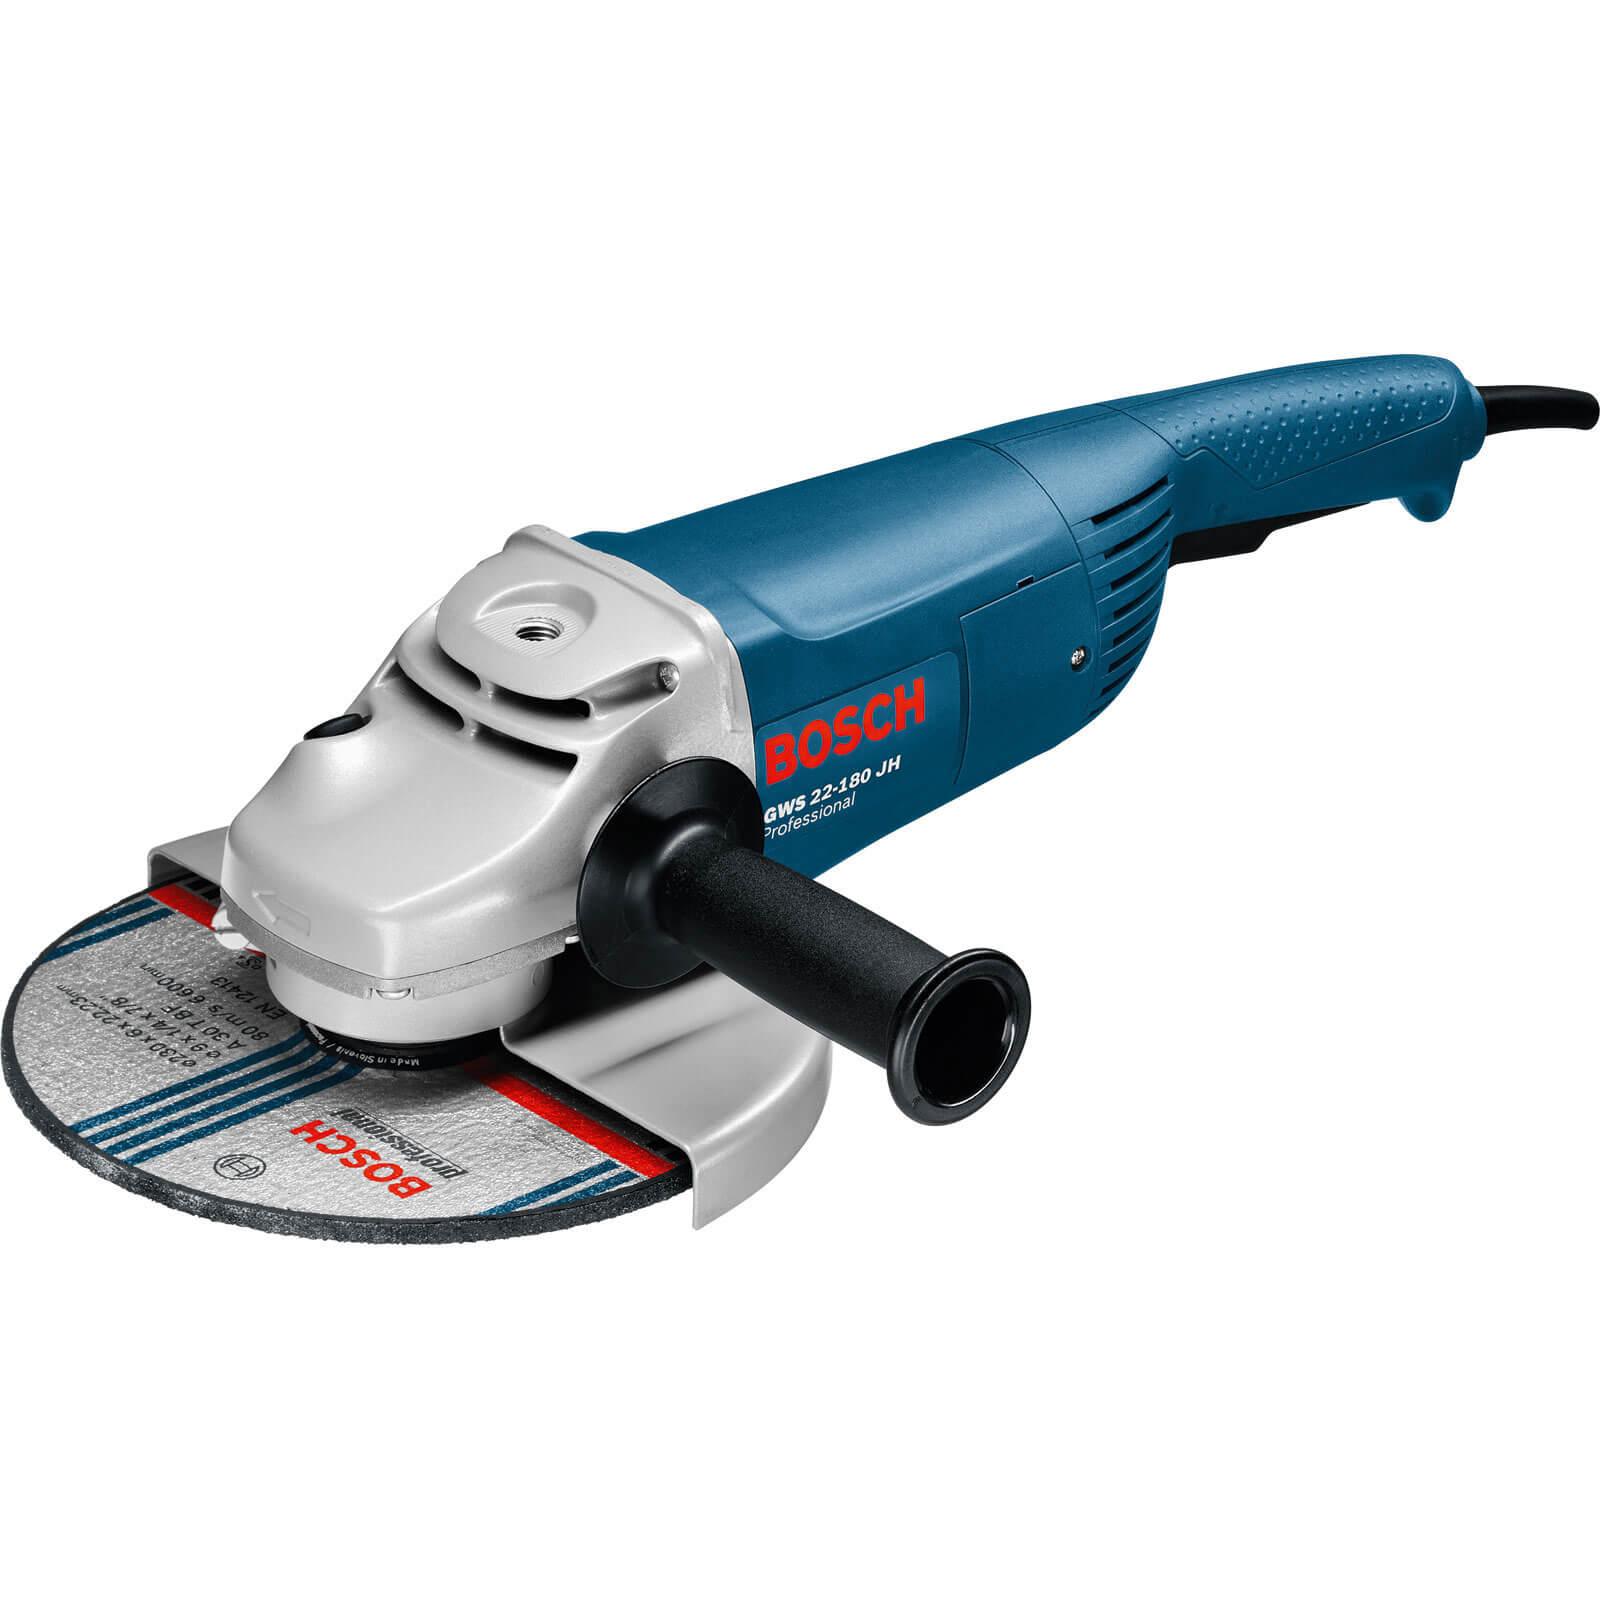 Bosch GWS22180 Angle Grinder 180mm 240v